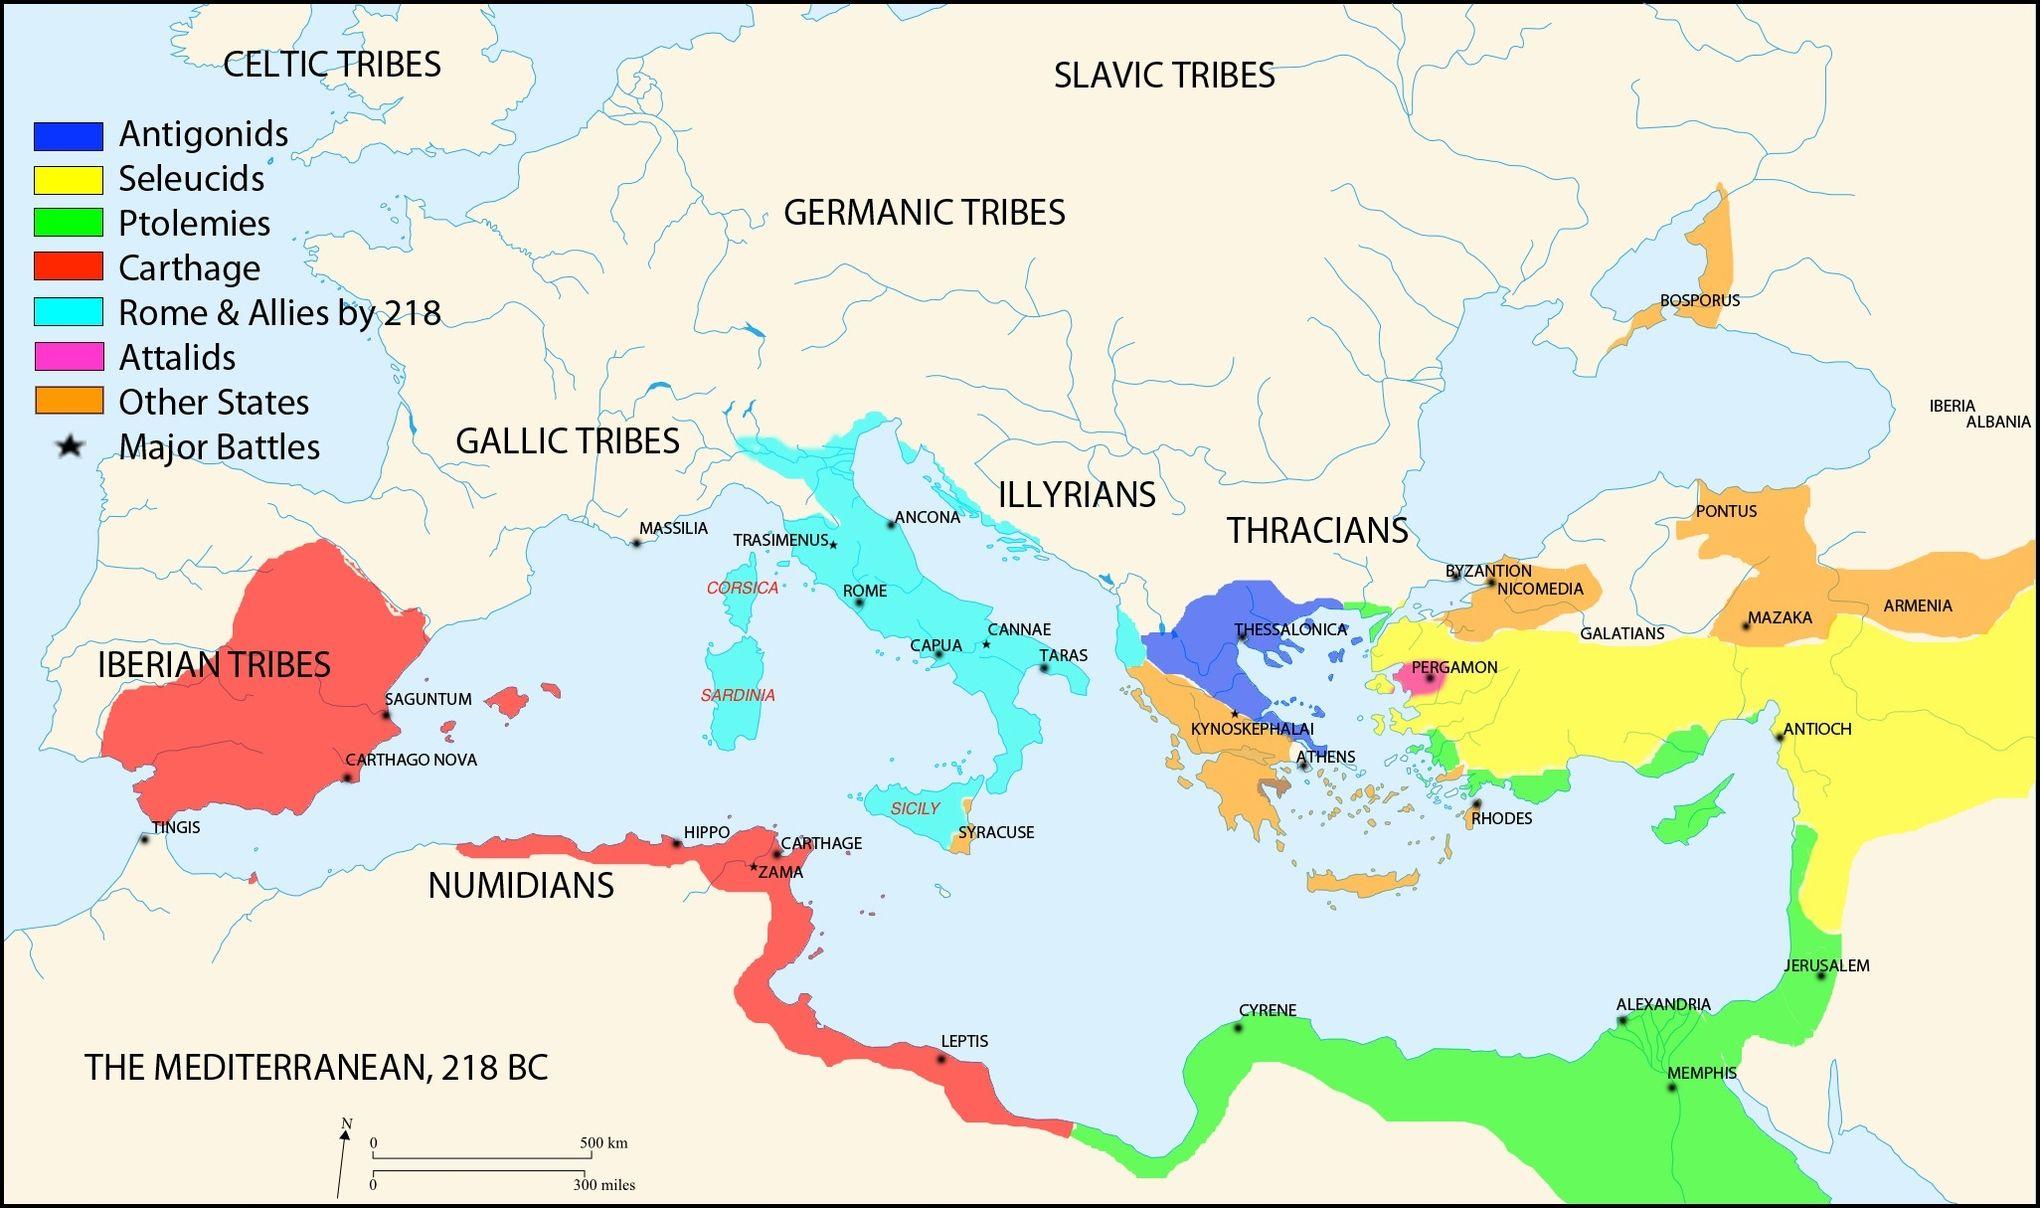 Maps That Explain The Roman Empire Punic Wars Emperor - Ancient rome map outline